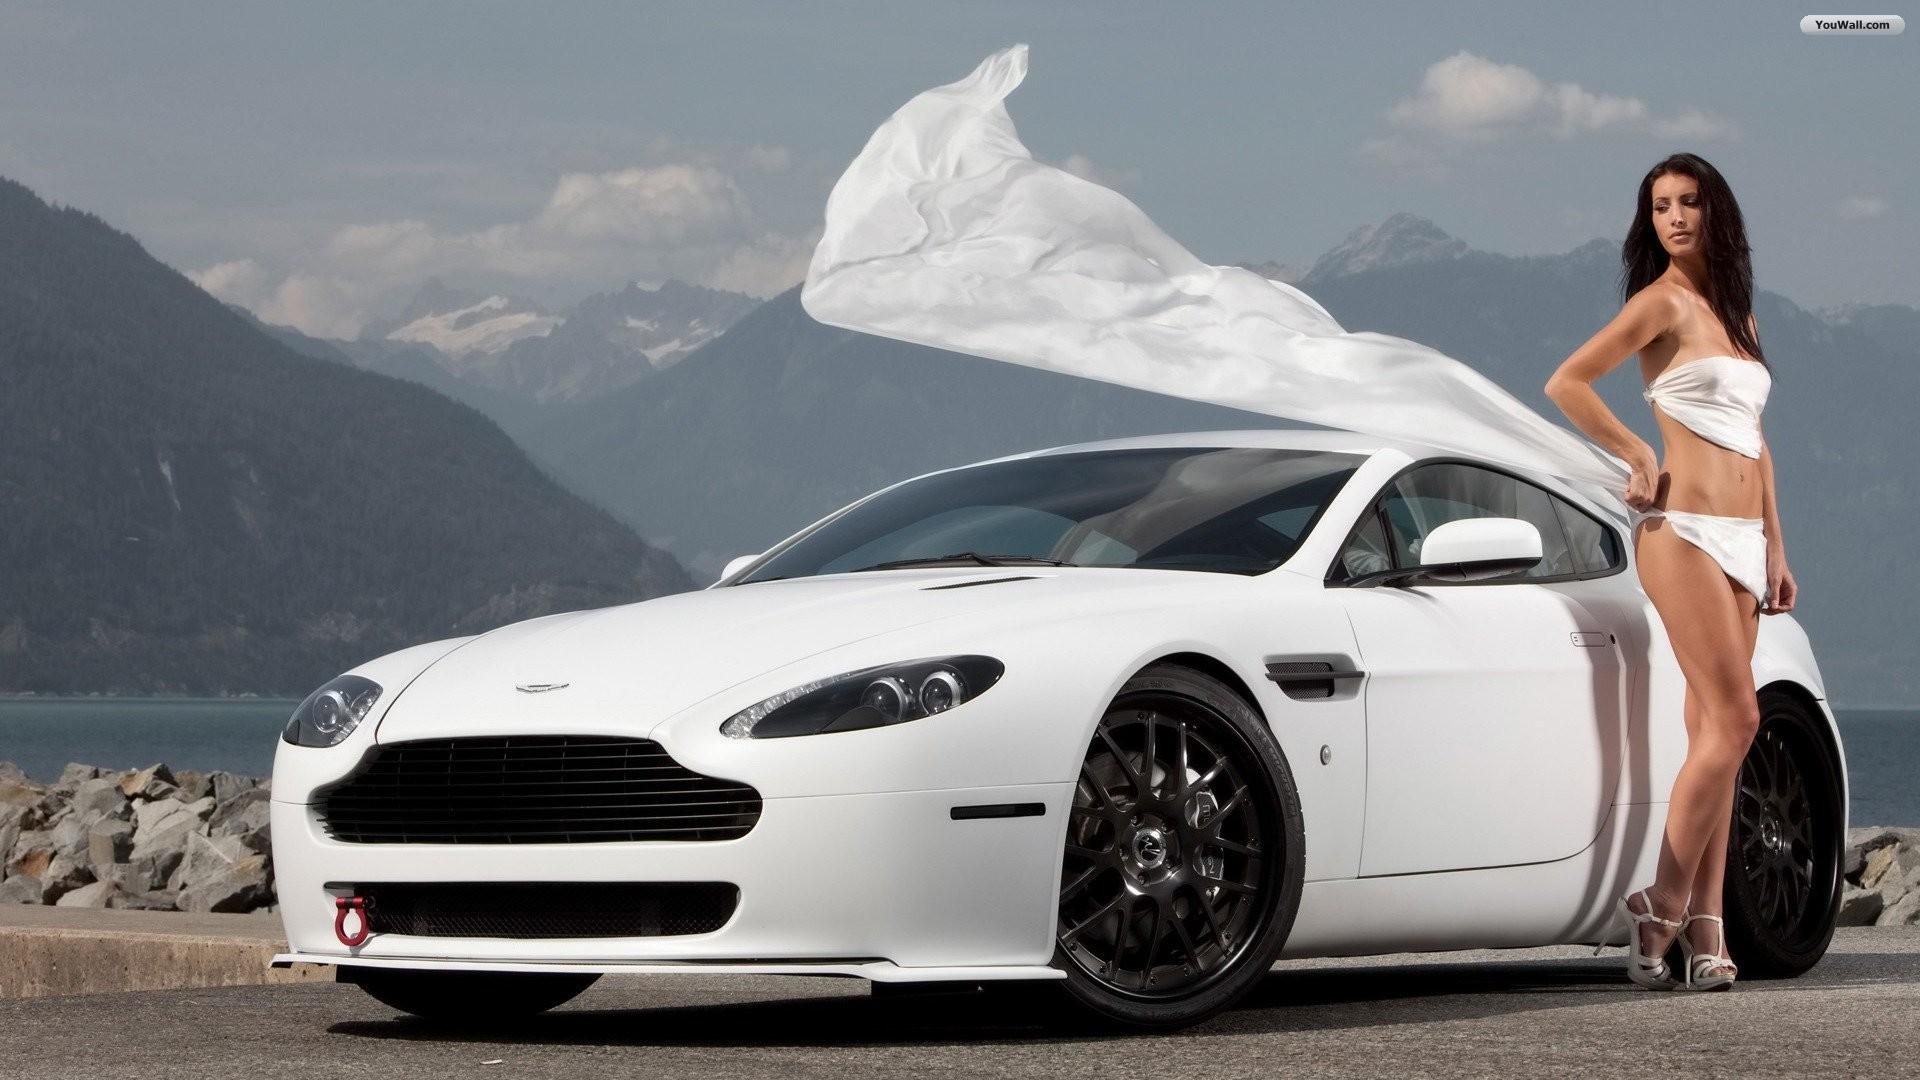 Cars Wallpaper Hd For Desktop Black 10 Wallpaper Full Hd P Cars Desktop  Backgrounds S Pics .